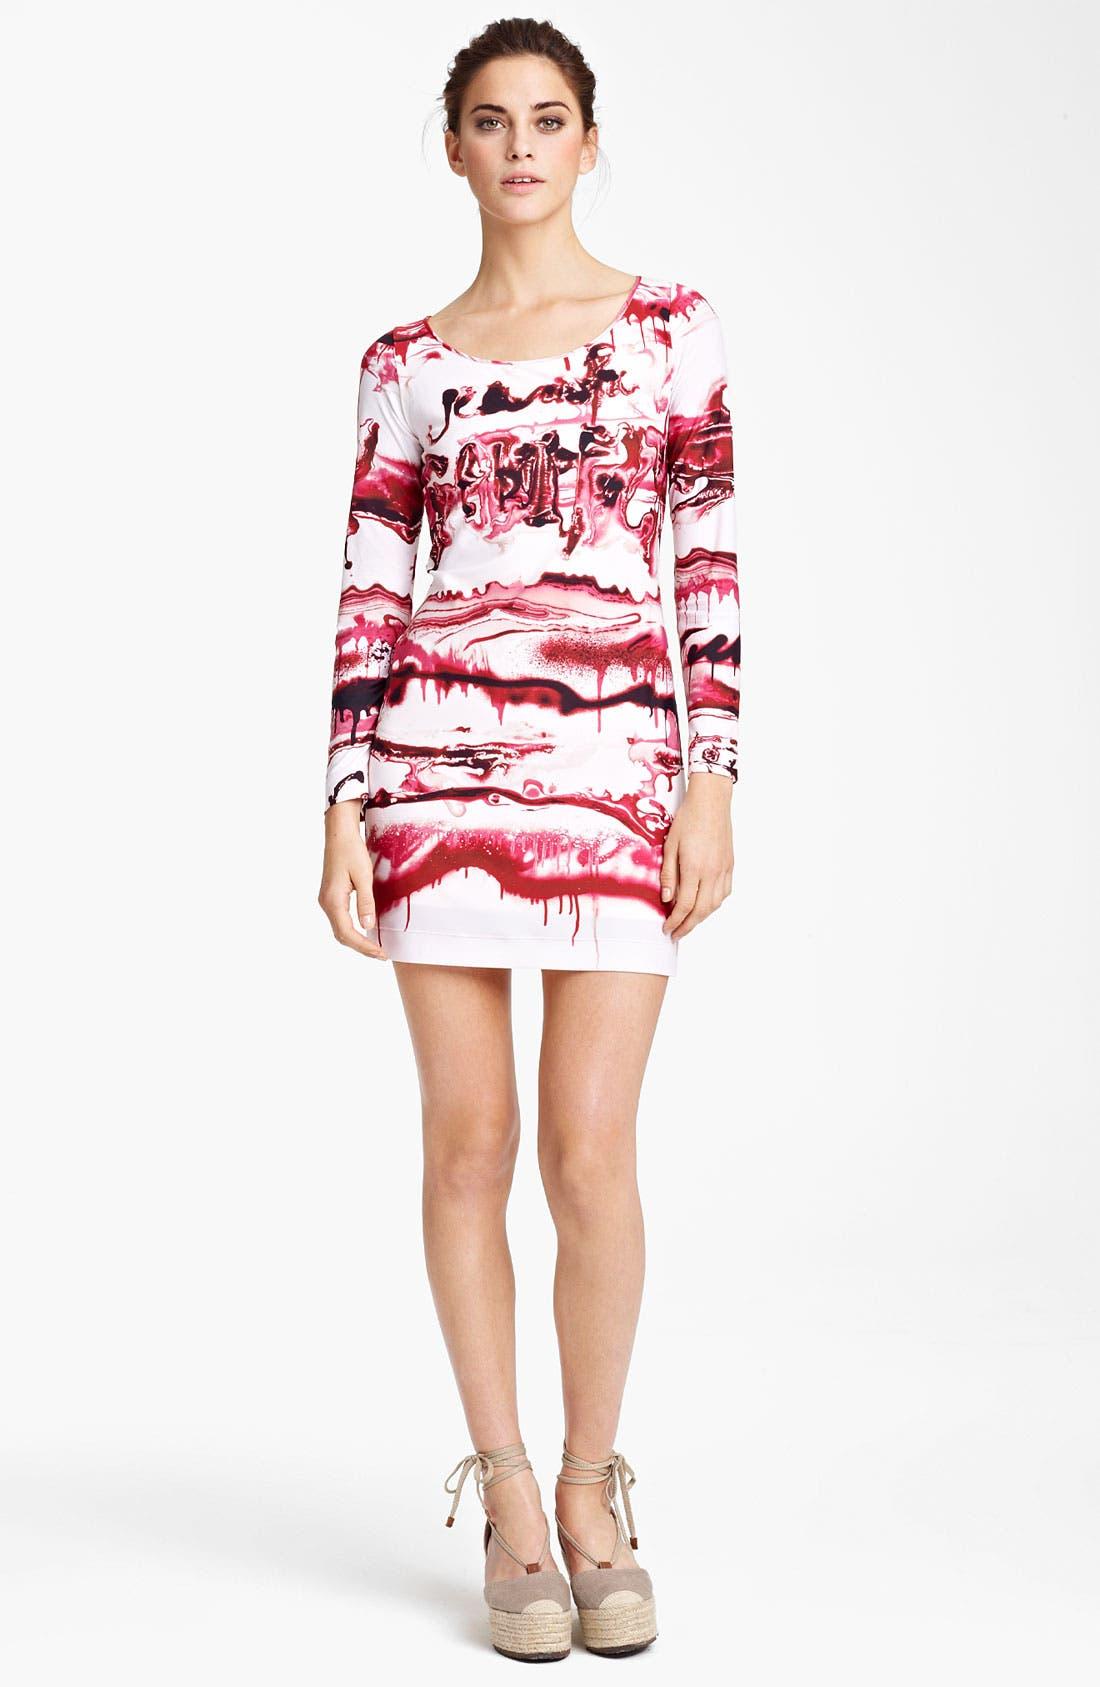 Alternate Image 1 Selected - Jean Paul Gaultier Fuzzi Graffiti Print Dress